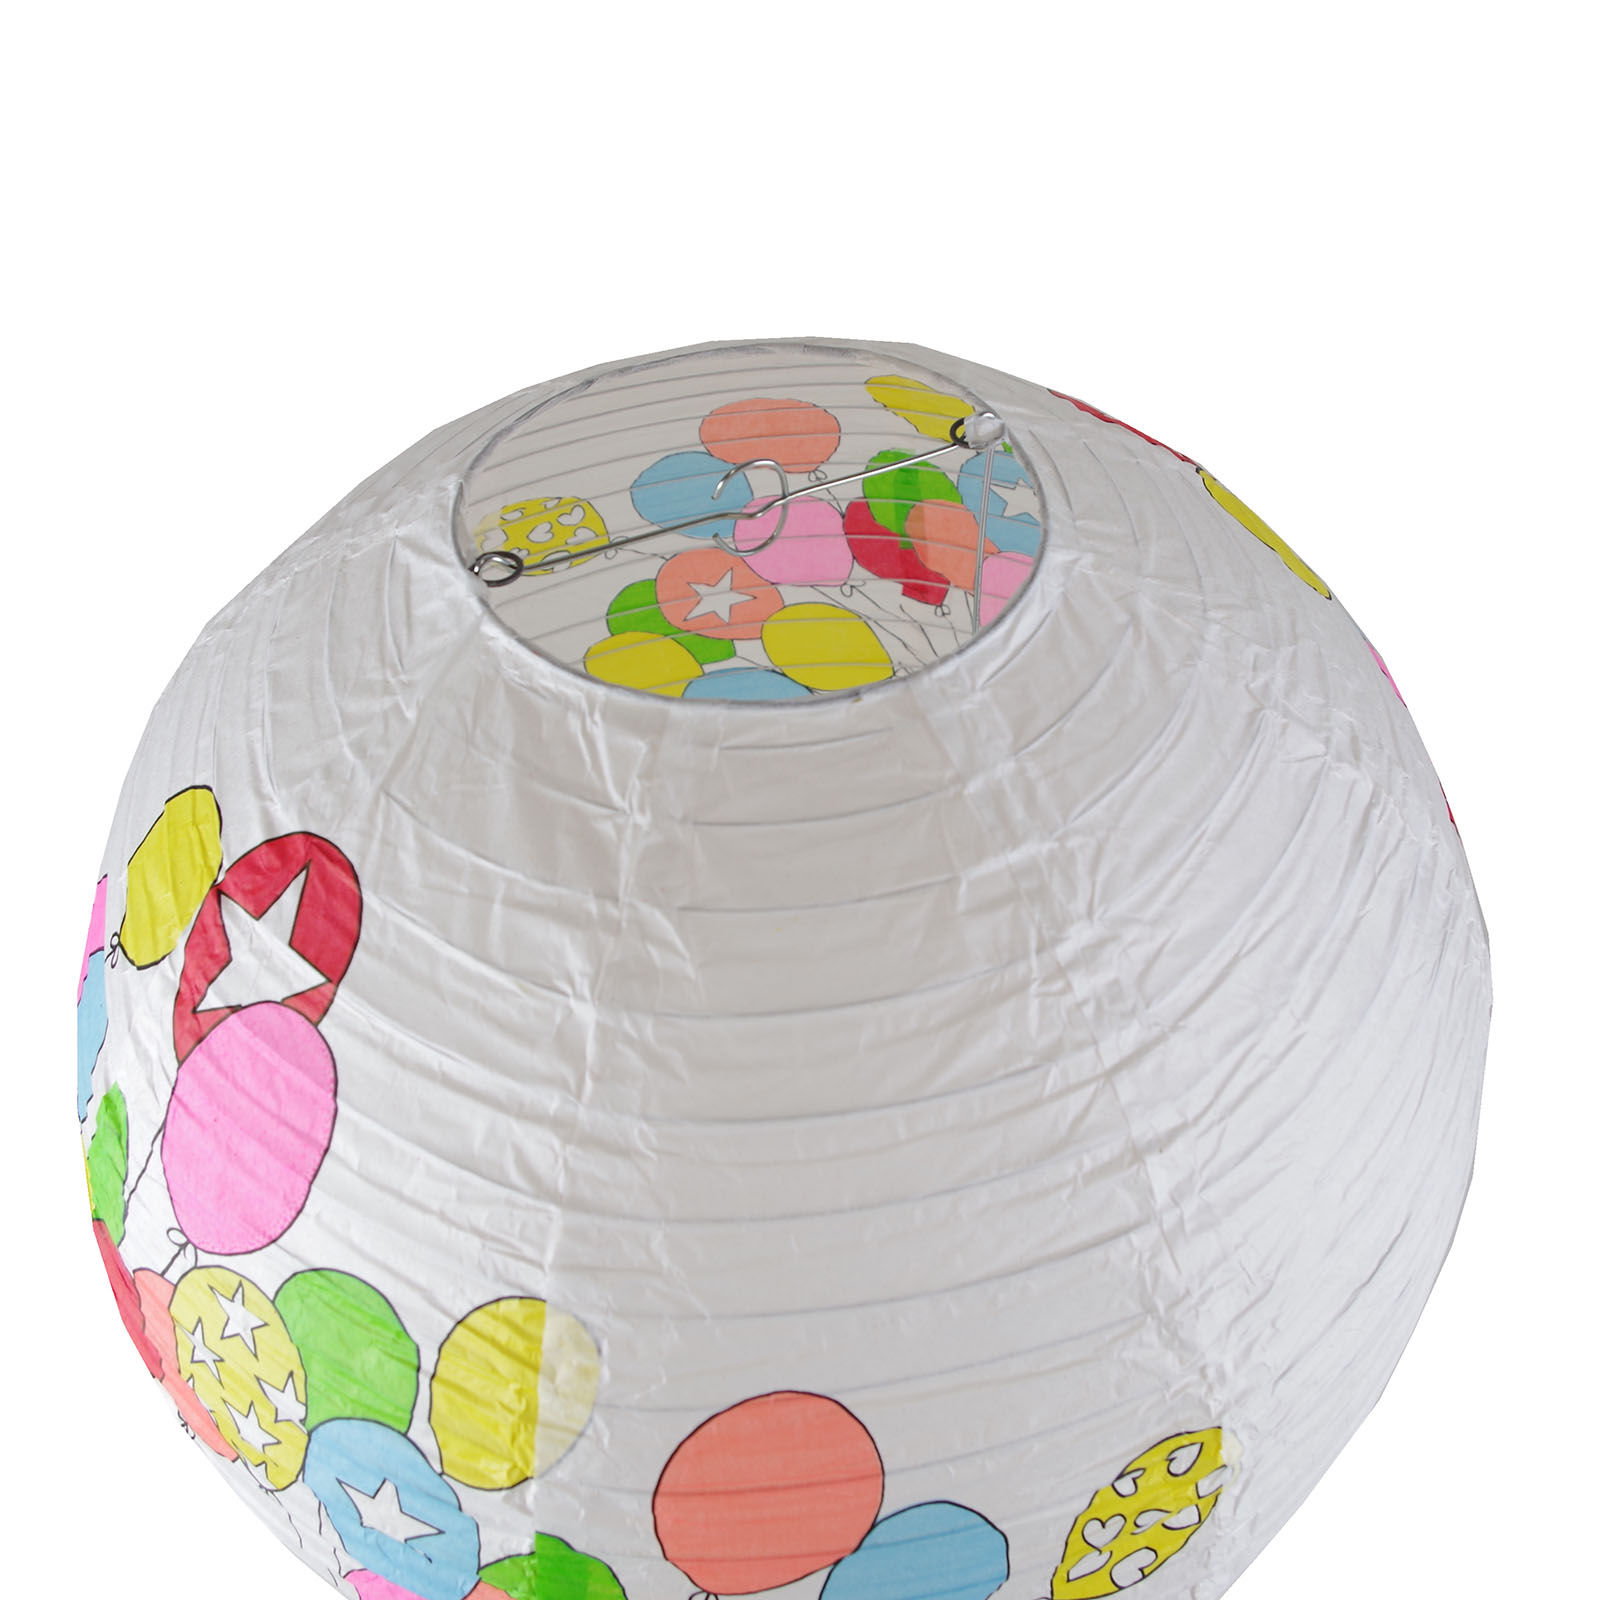 Papierlampe kinderzimmer papierleuchte kinder leuchte h ngeleuchte lampion - Lampions kinderzimmer ...